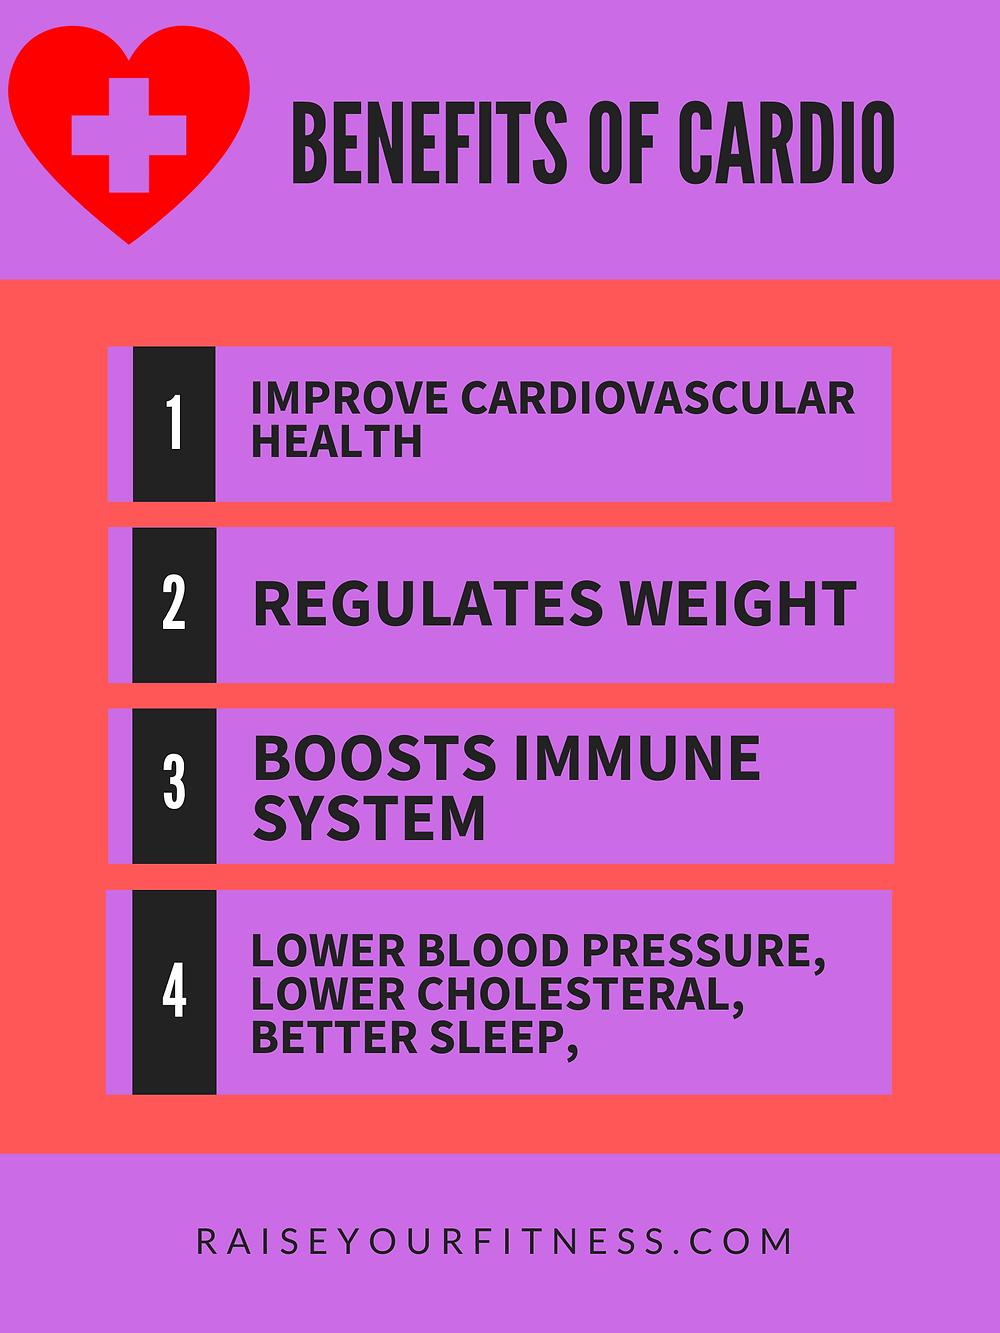 Summarizing the benefits of cardio that we talked about